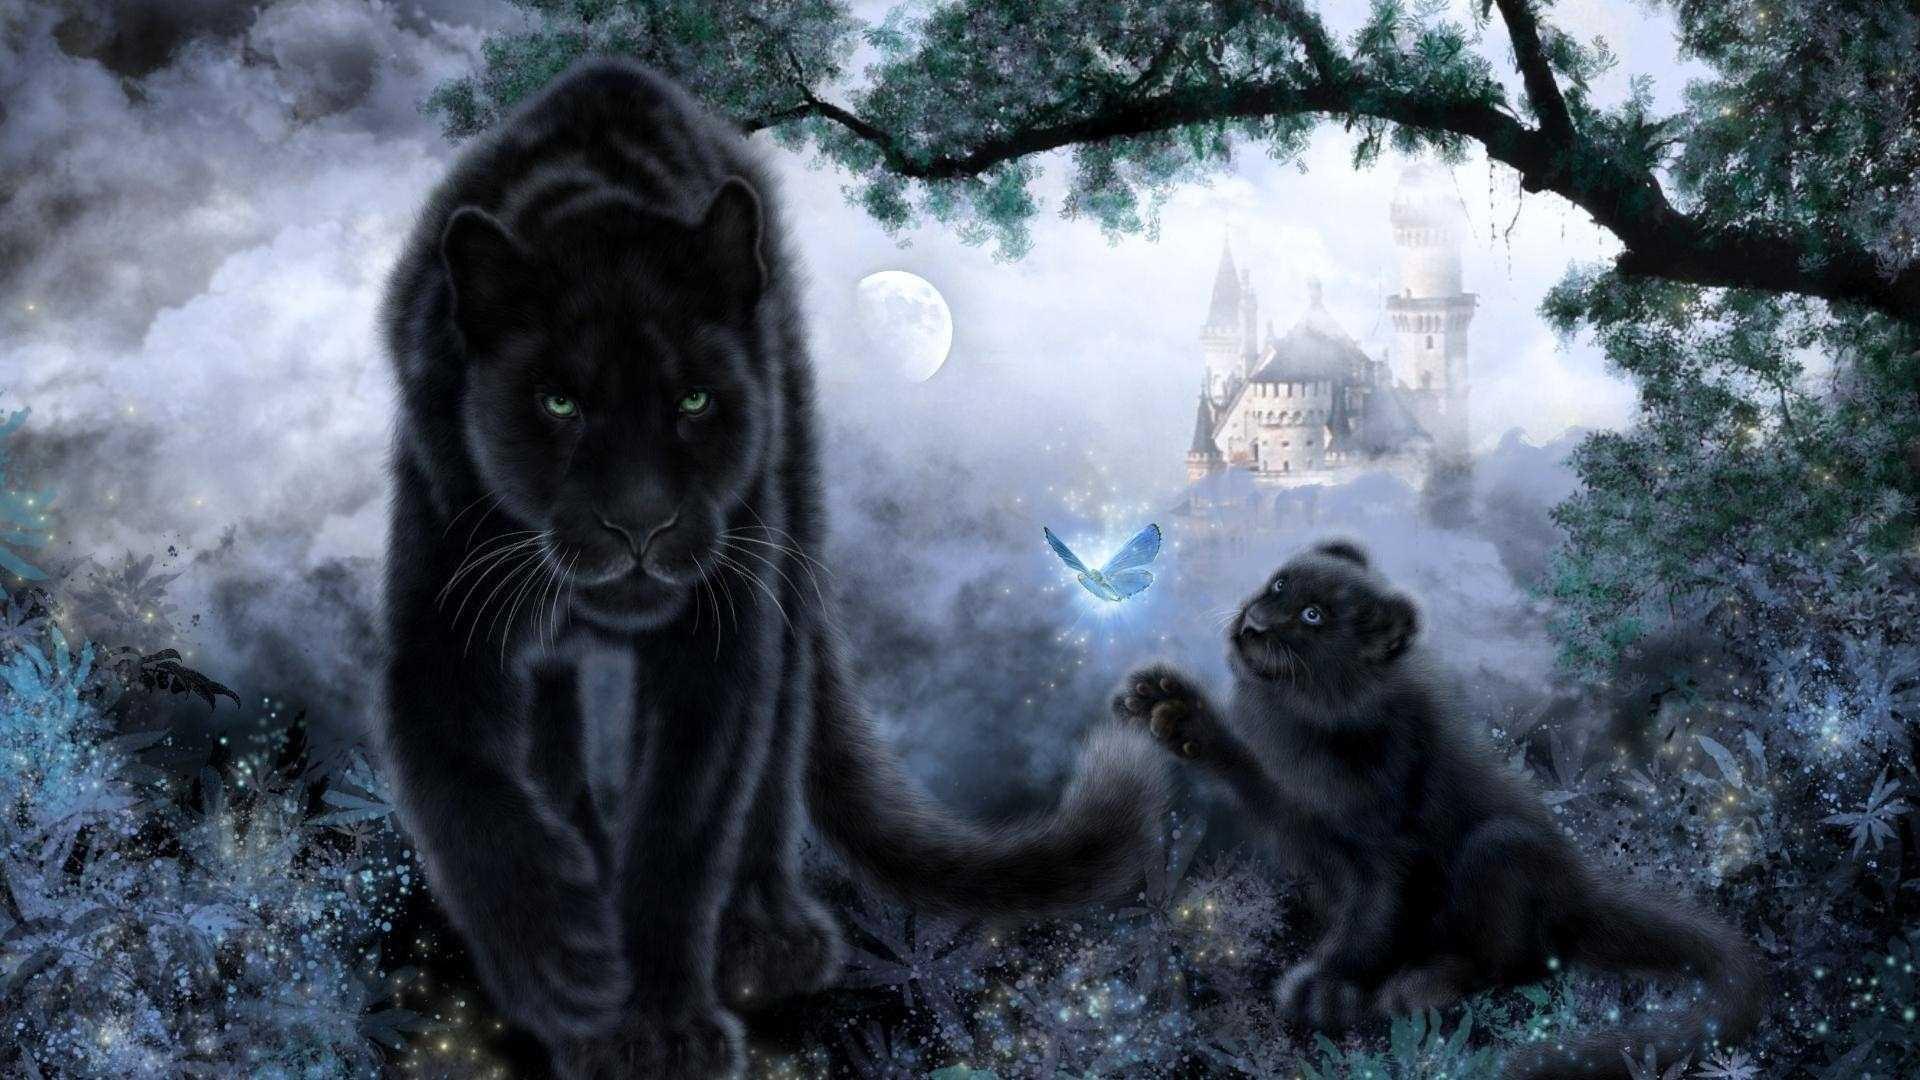 Black cat christmas wallpaper 55 images 1920x1080 full hd hello kitty halloween wallpaper voltagebd Images